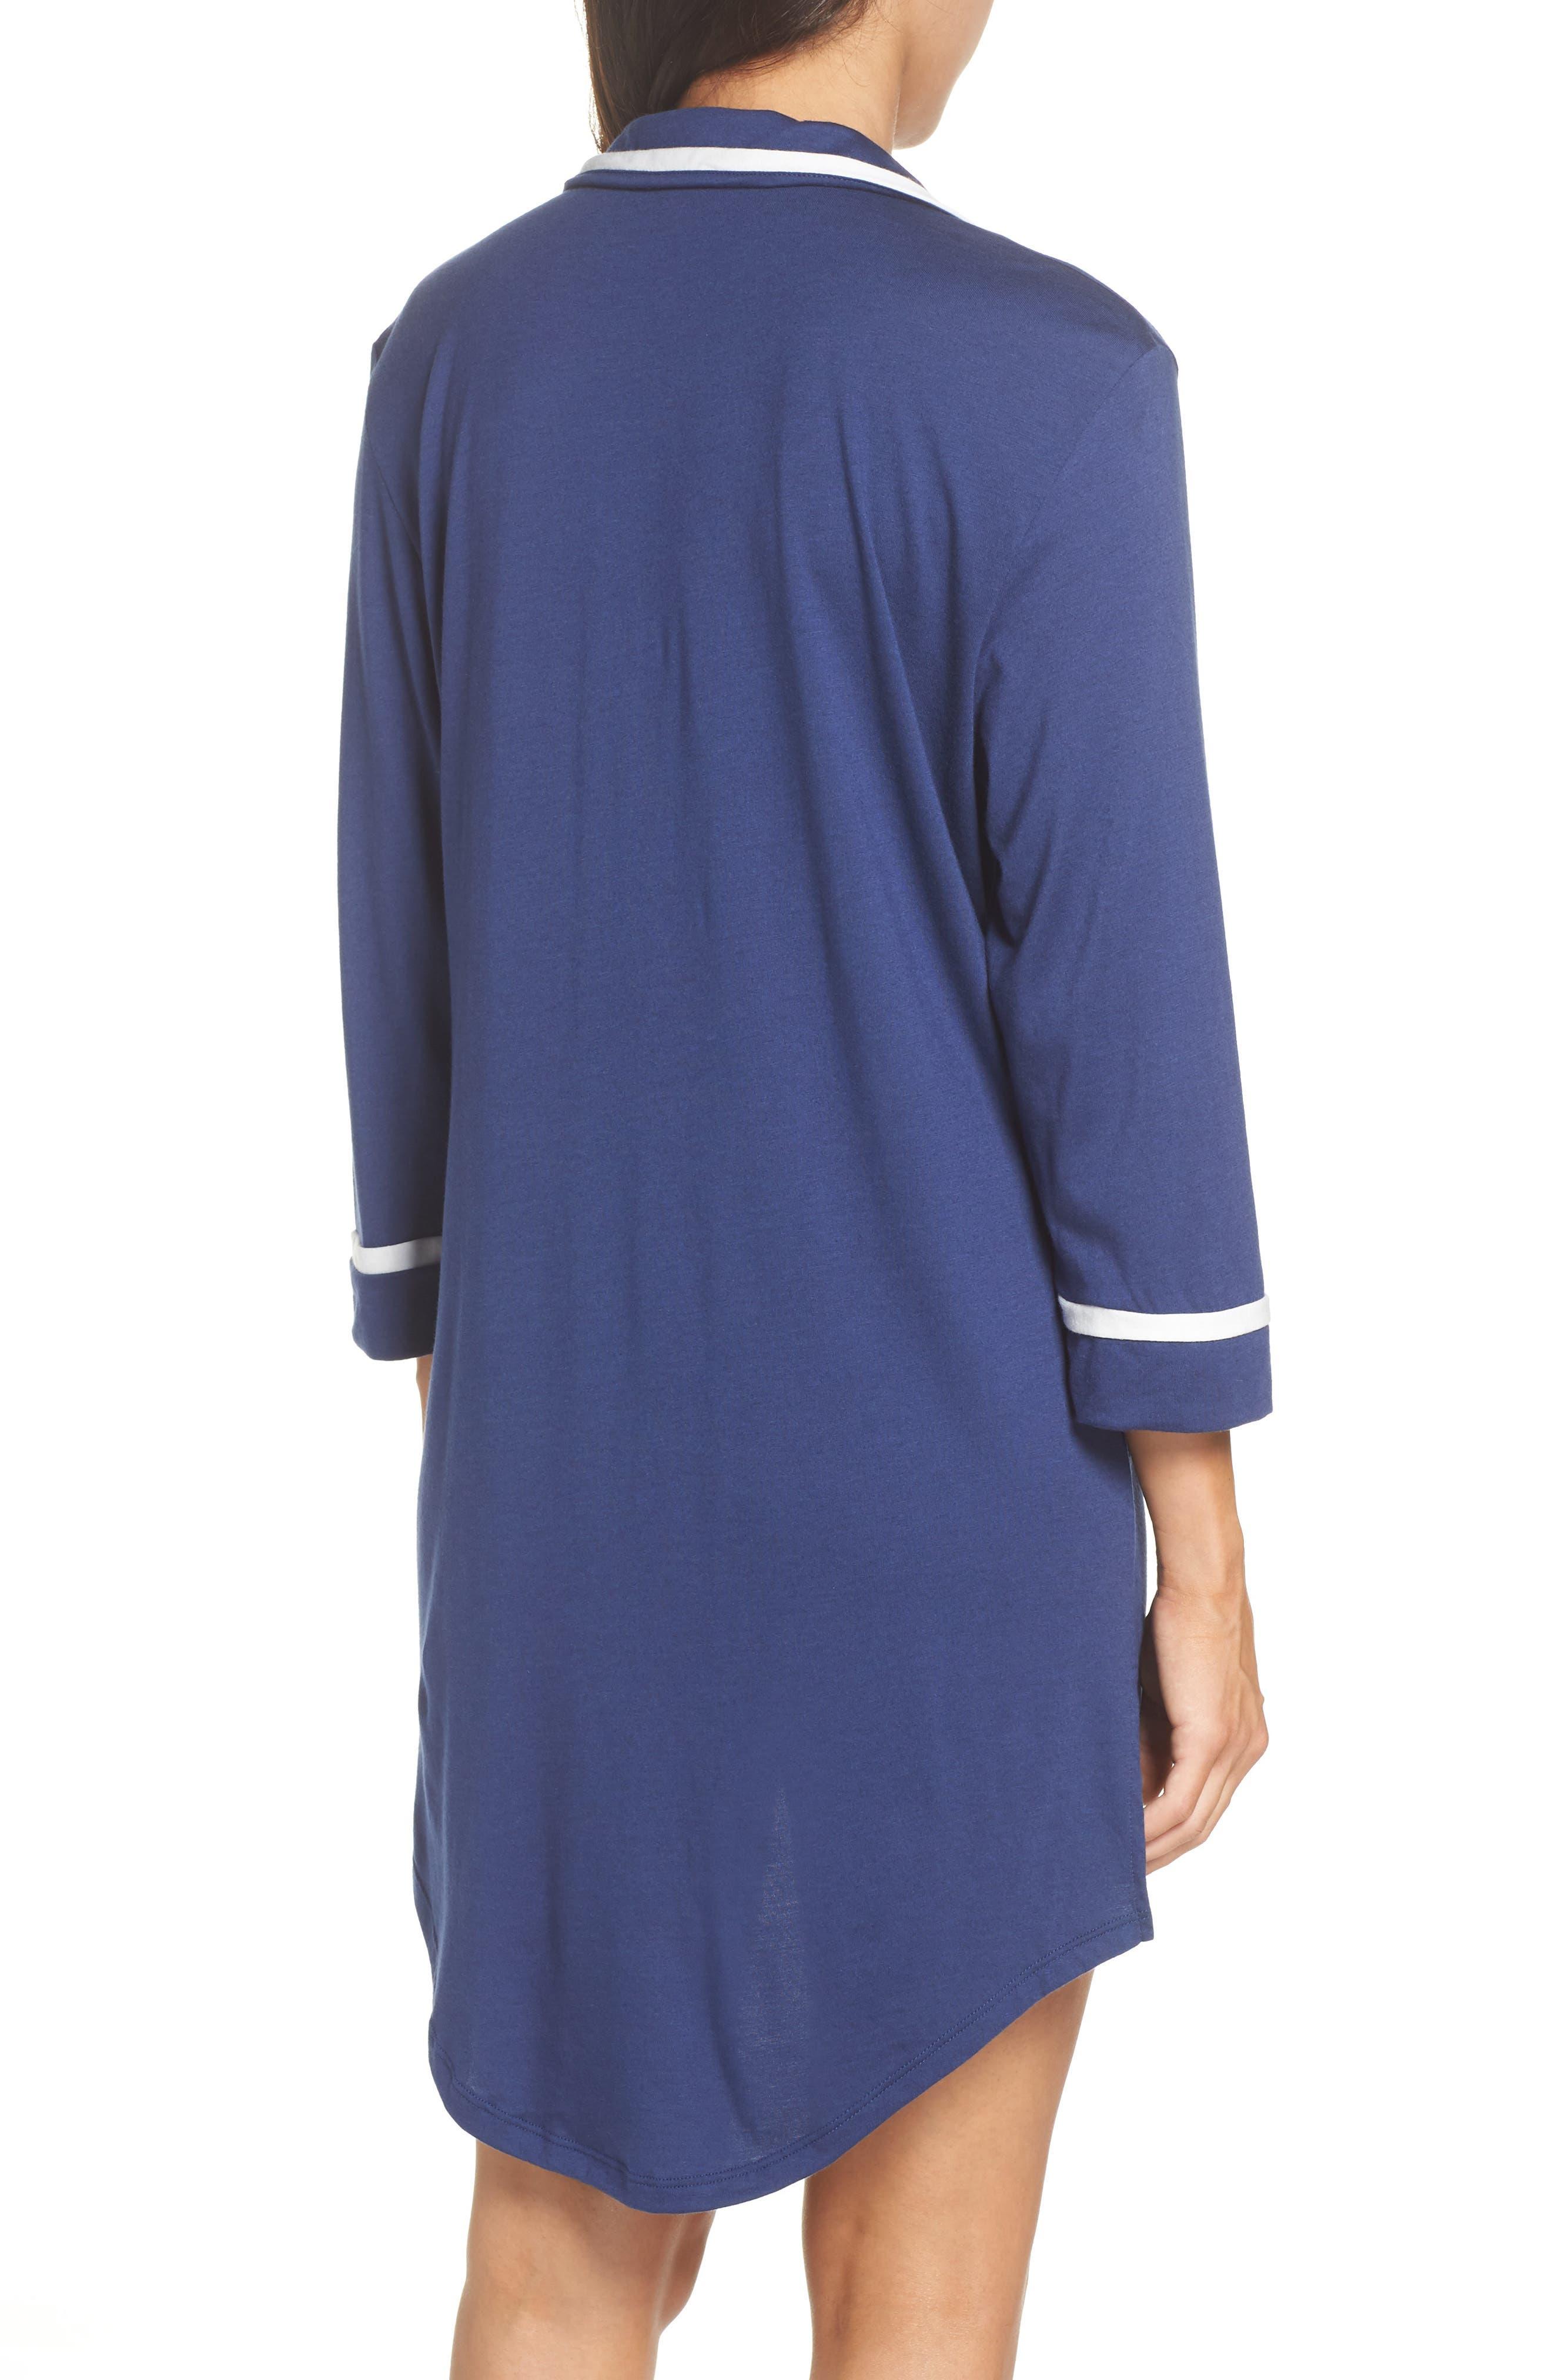 Amore Sleep Shirt,                             Alternate thumbnail 2, color,                             MARINE BLUE MOON/ IVORY